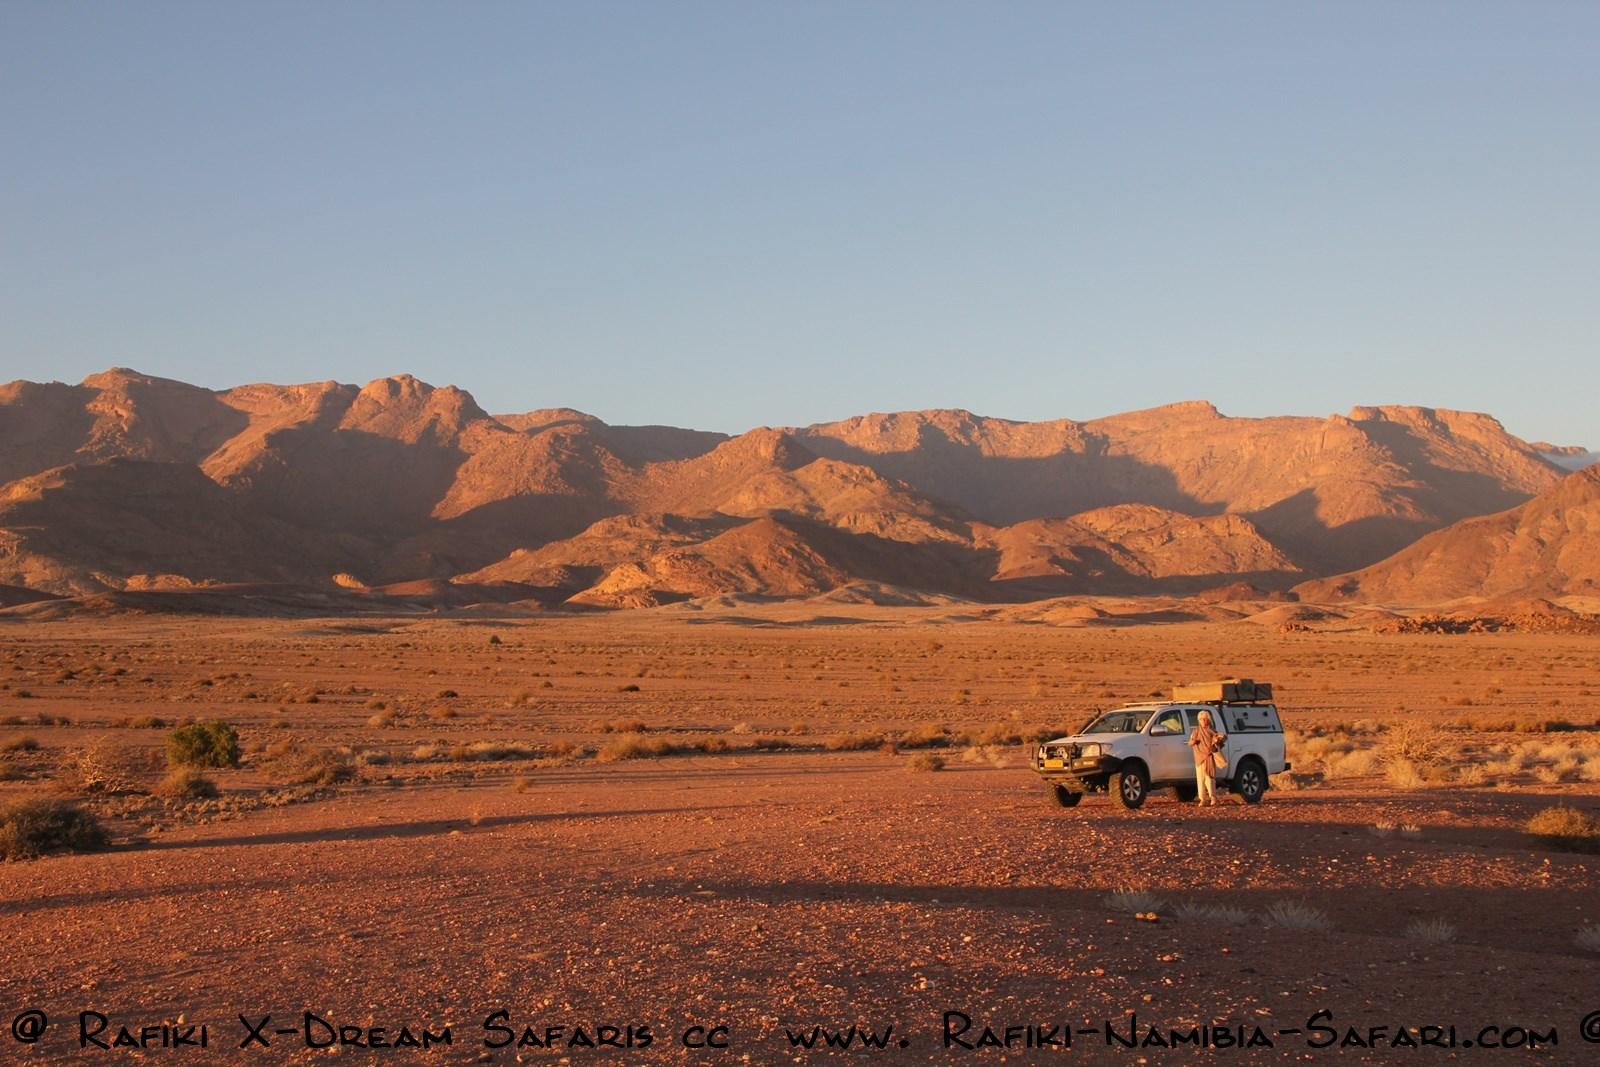 Selbstfahrer Safaris